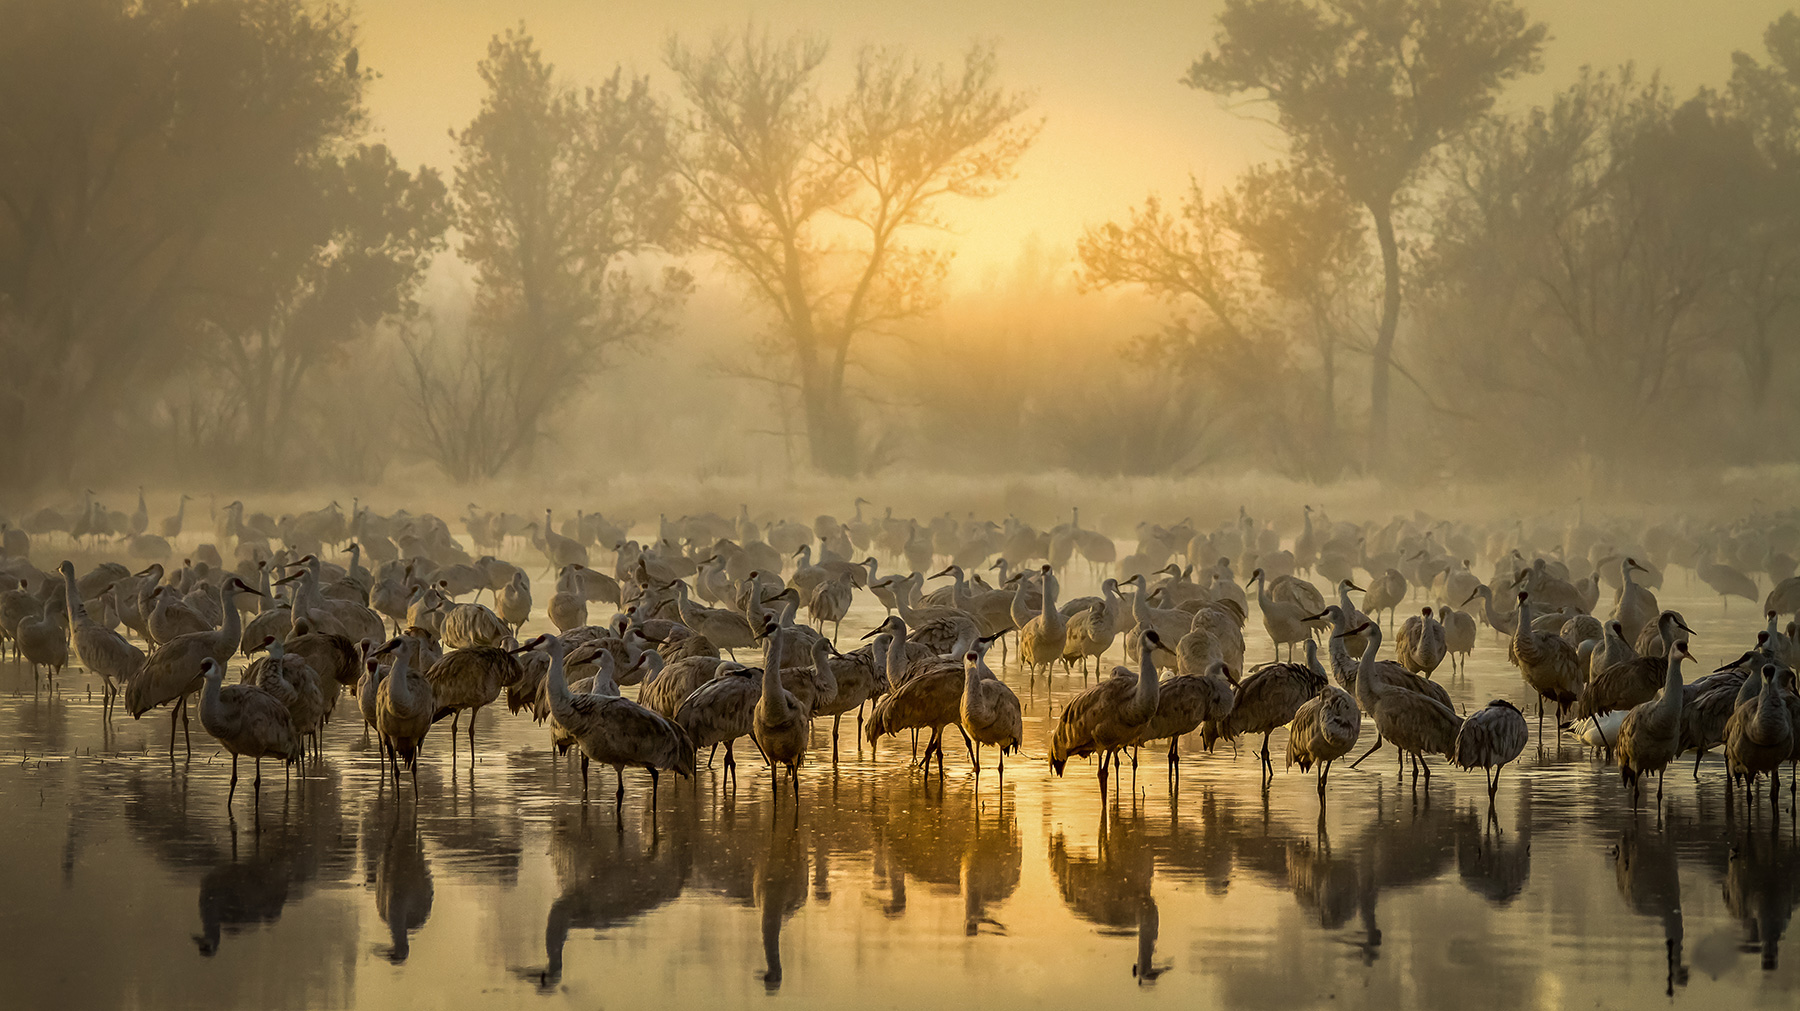 'Foggy Sunrise in Bernado',  1st Place Plants & Animals, Steve Yabek